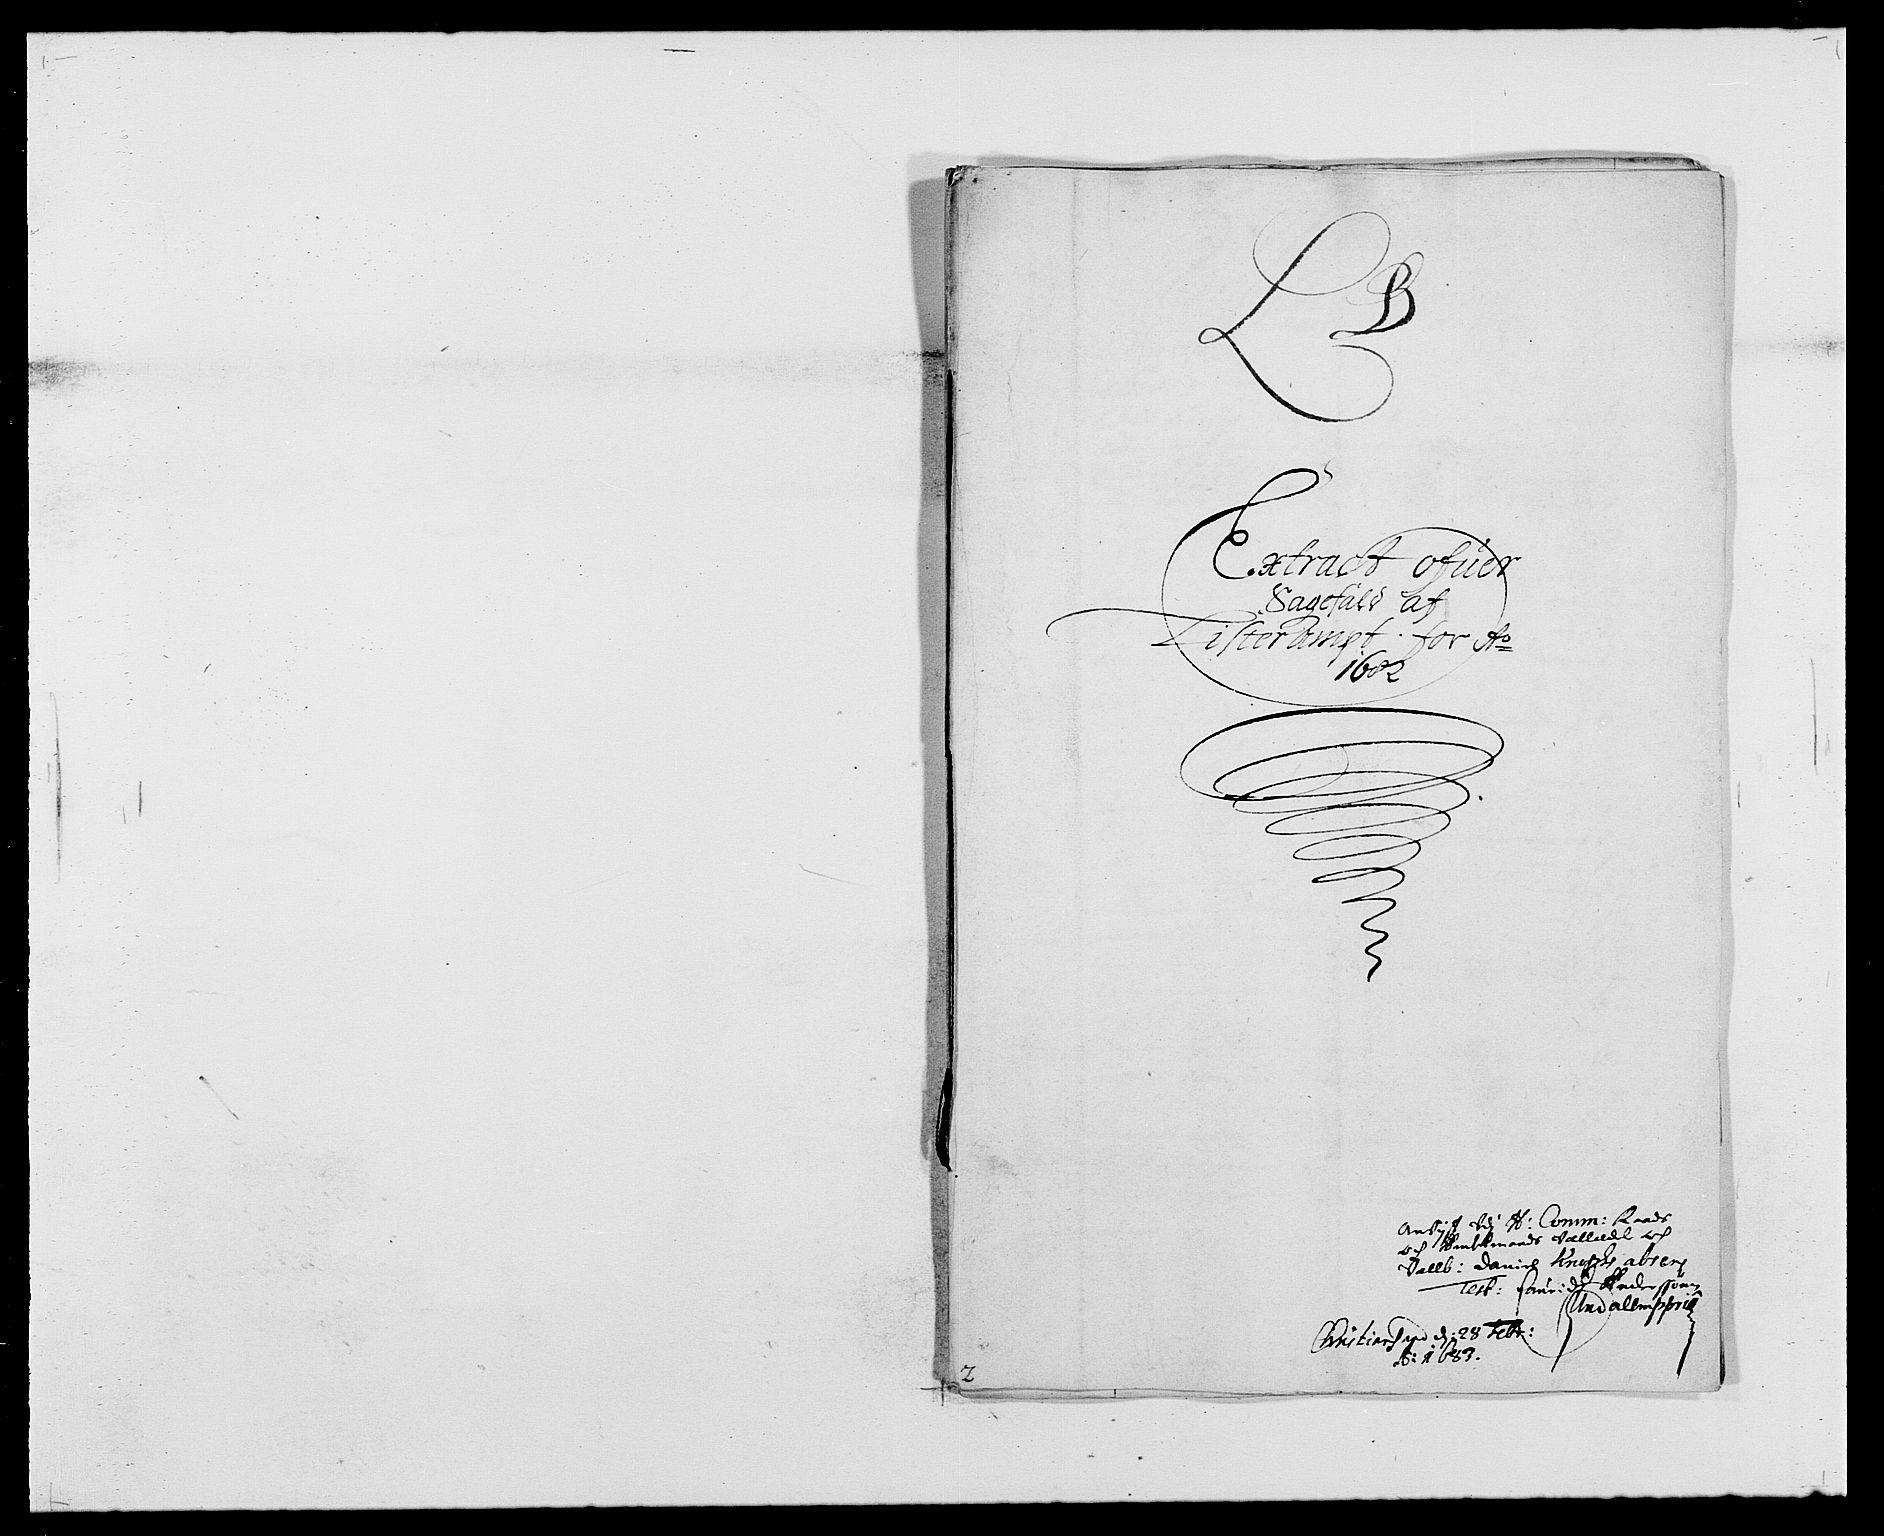 RA, Rentekammeret inntil 1814, Reviderte regnskaper, Fogderegnskap, R41/L2531: Fogderegnskap Lista, 1680-1682, s. 170